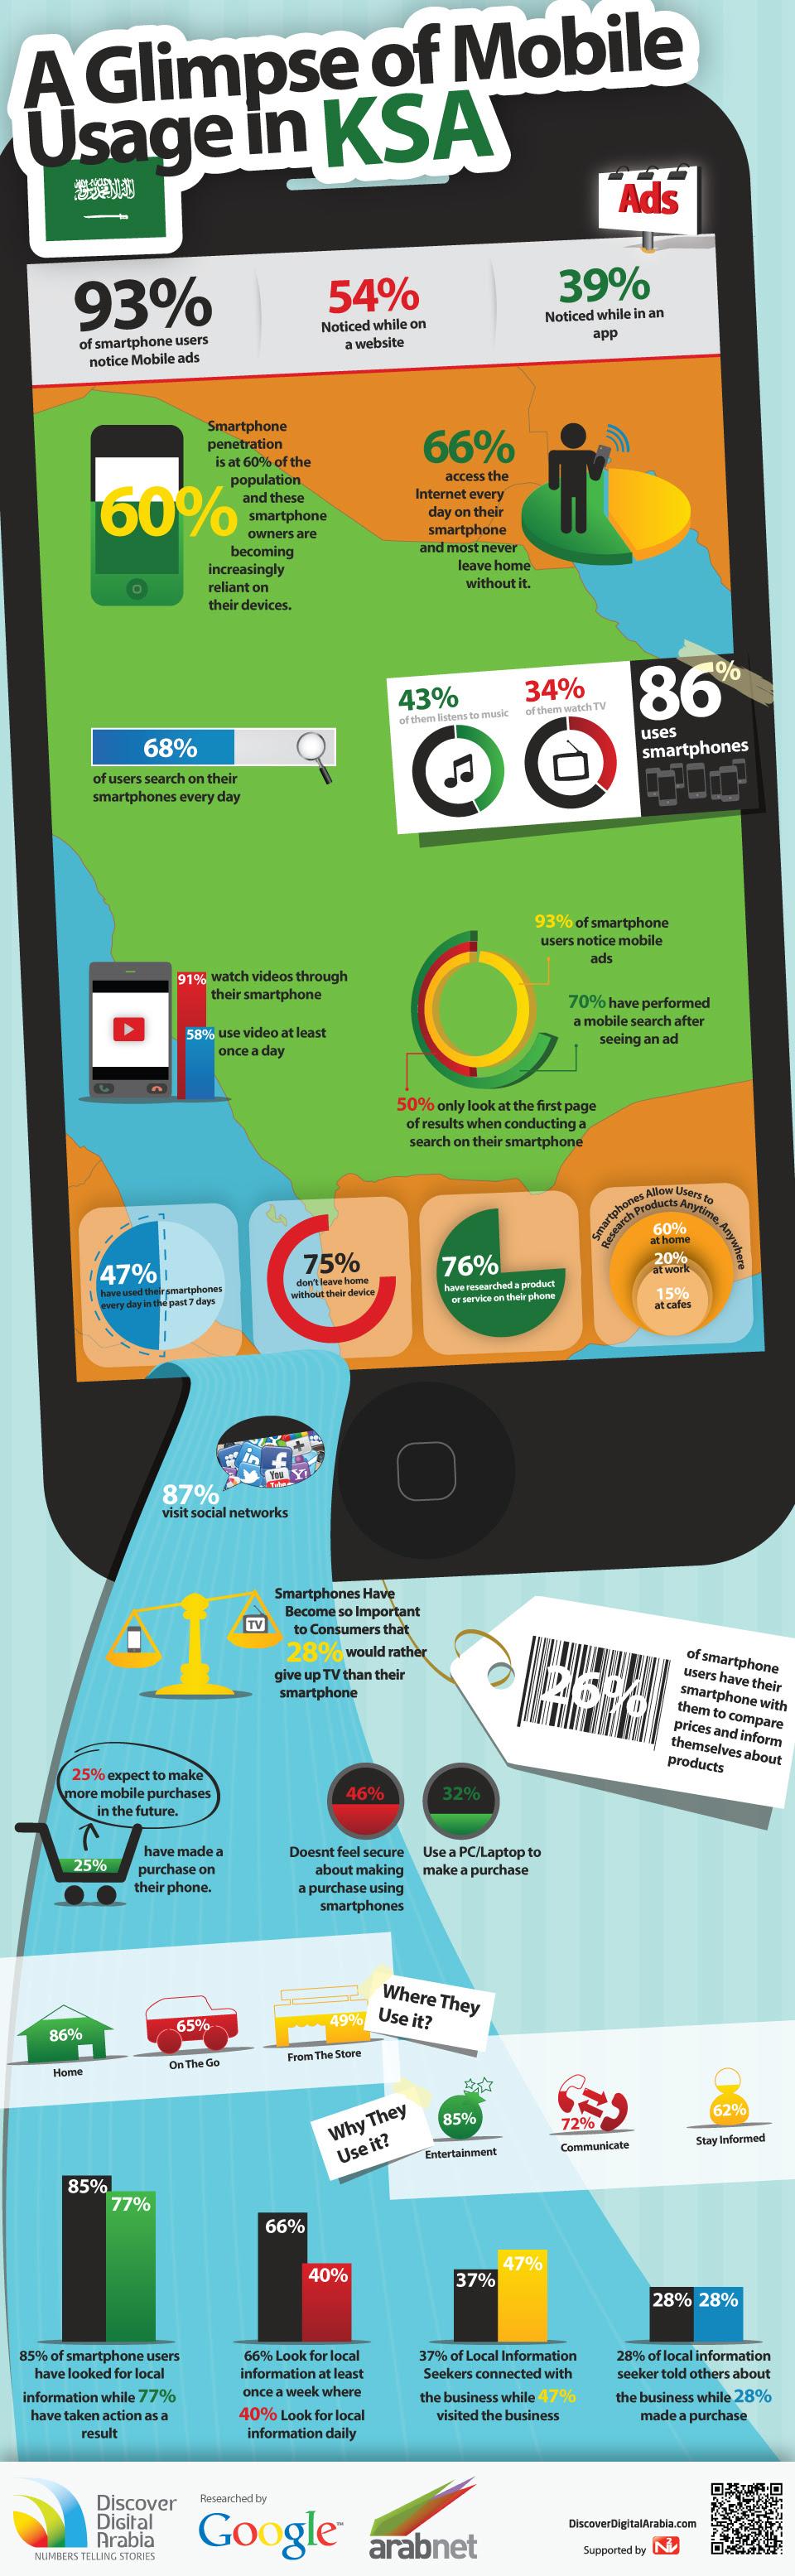 MobileKSA انفوجرافيك: انتشار الهواتف الذكية في الامارات والسعودية [احصائيات]